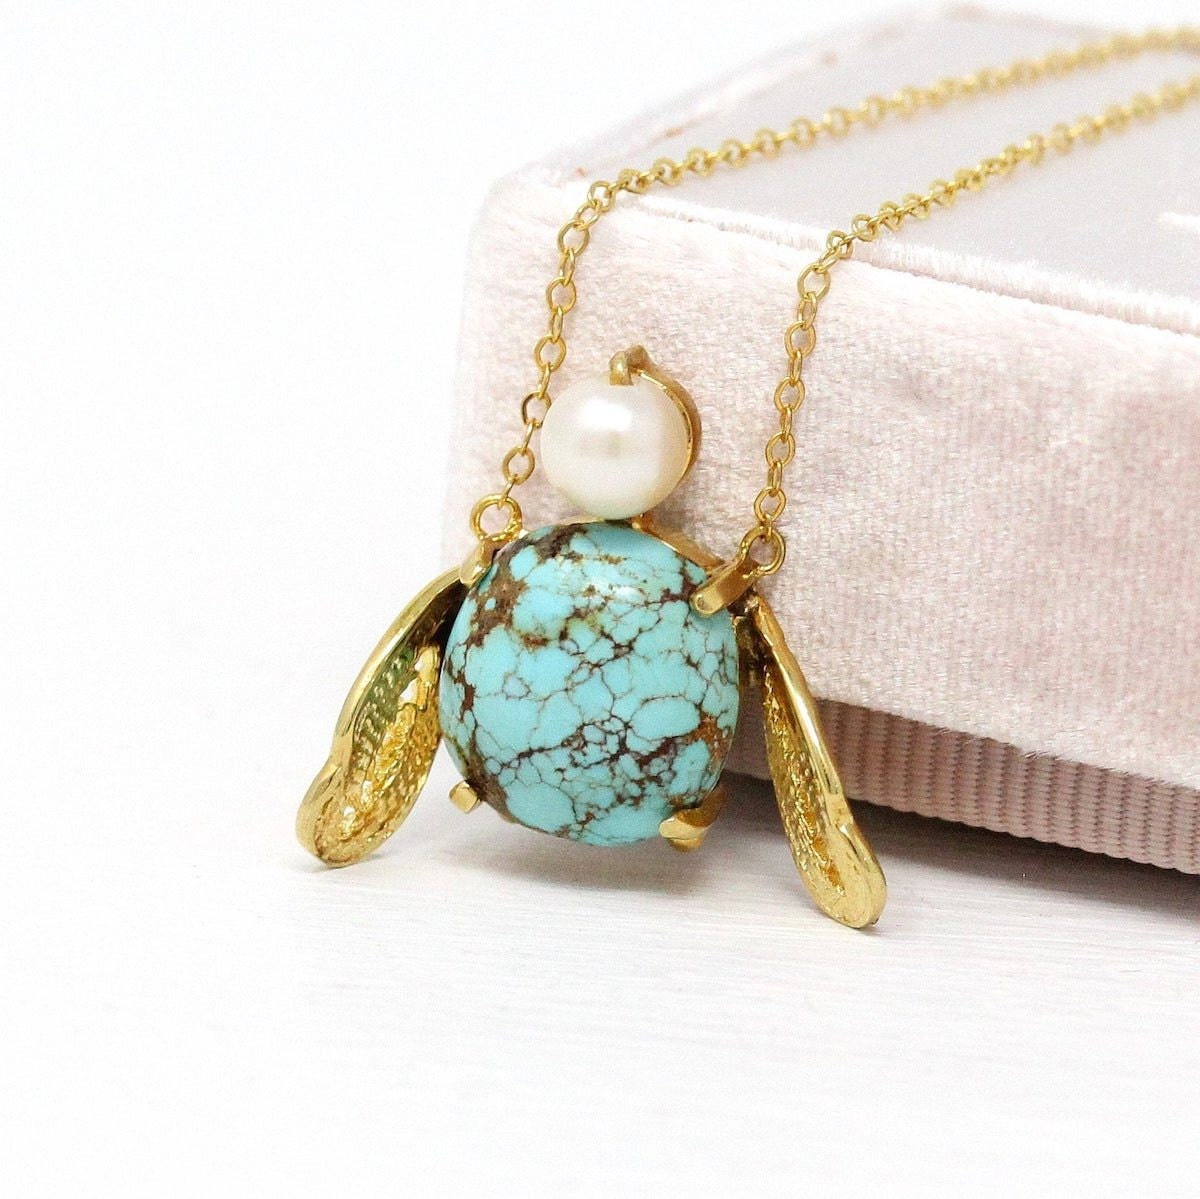 Vintage turquoise bug necklace from Maejean Vintage